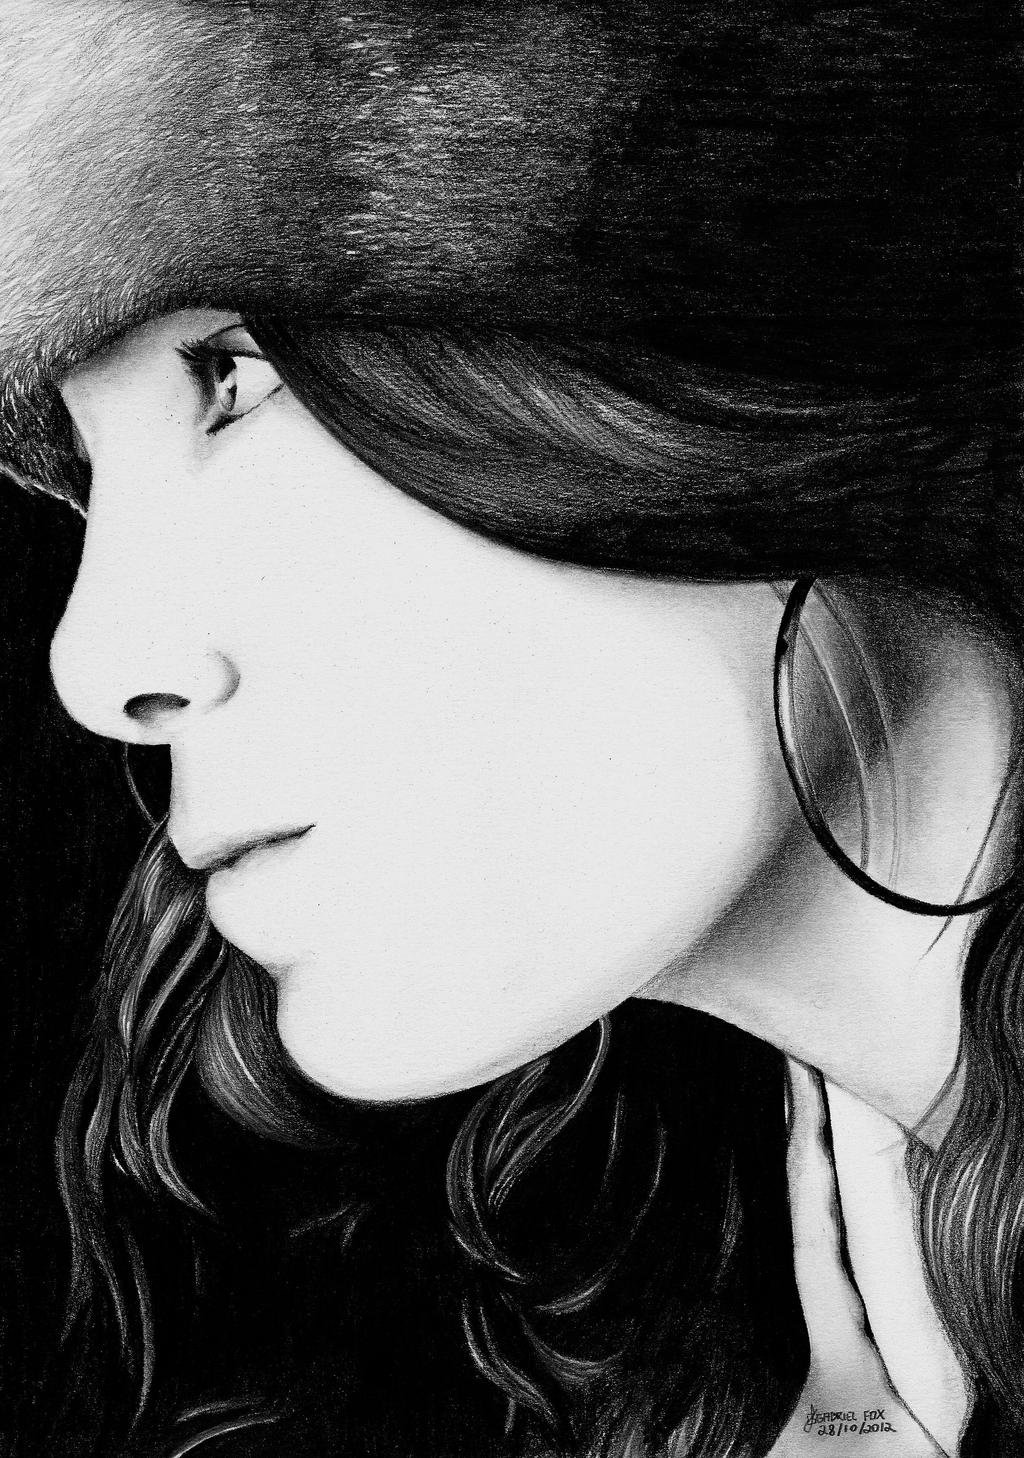 Maria Romeu by foxartsbrazil